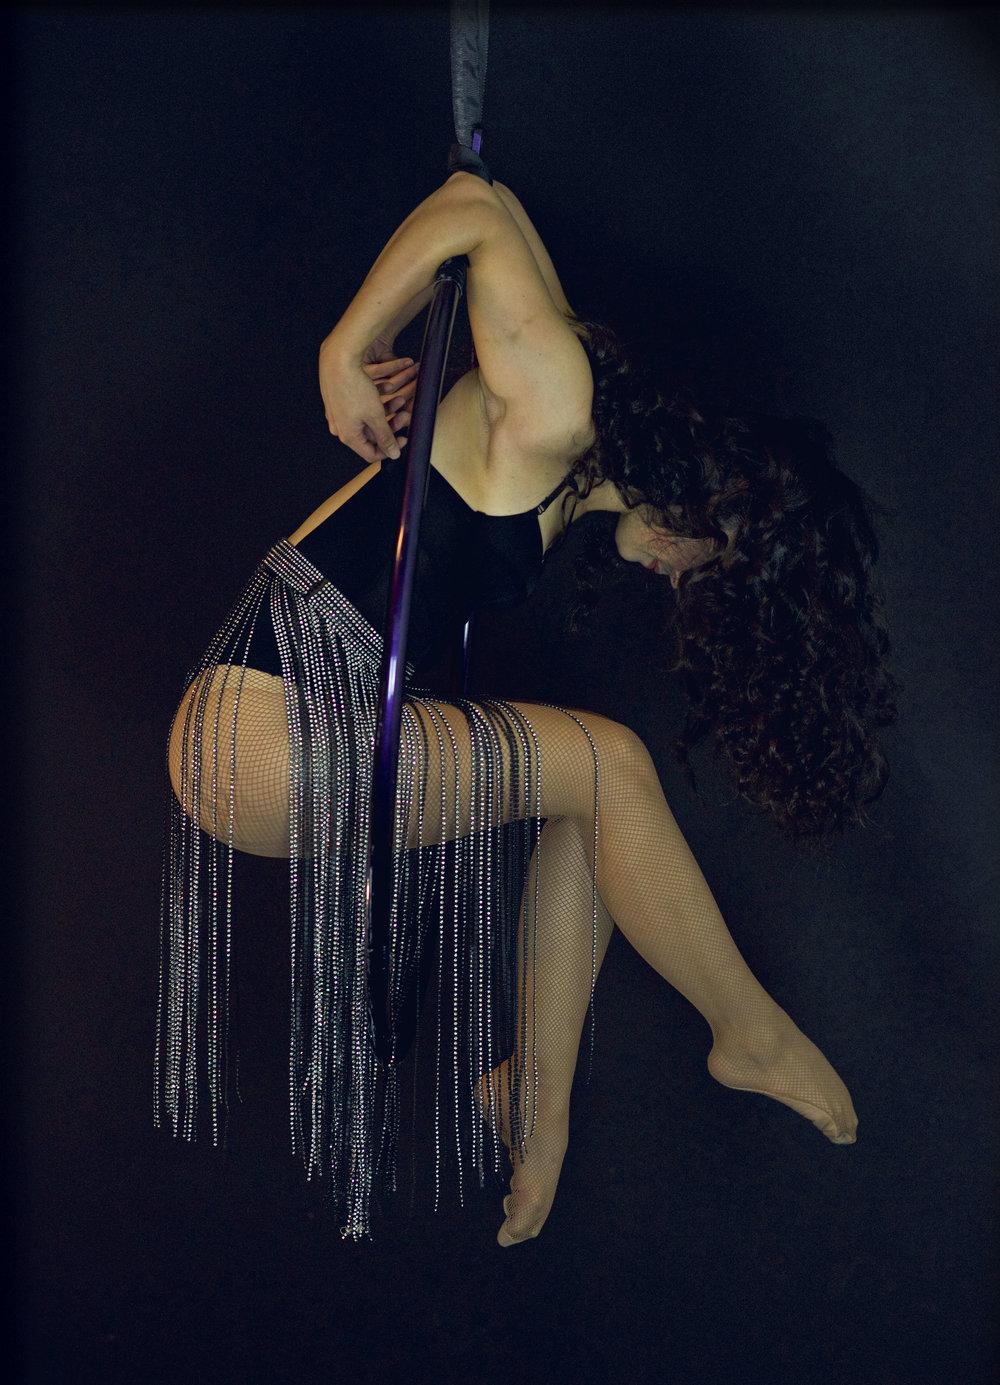 Wrara Plesoiu aerial hoop hanging pose